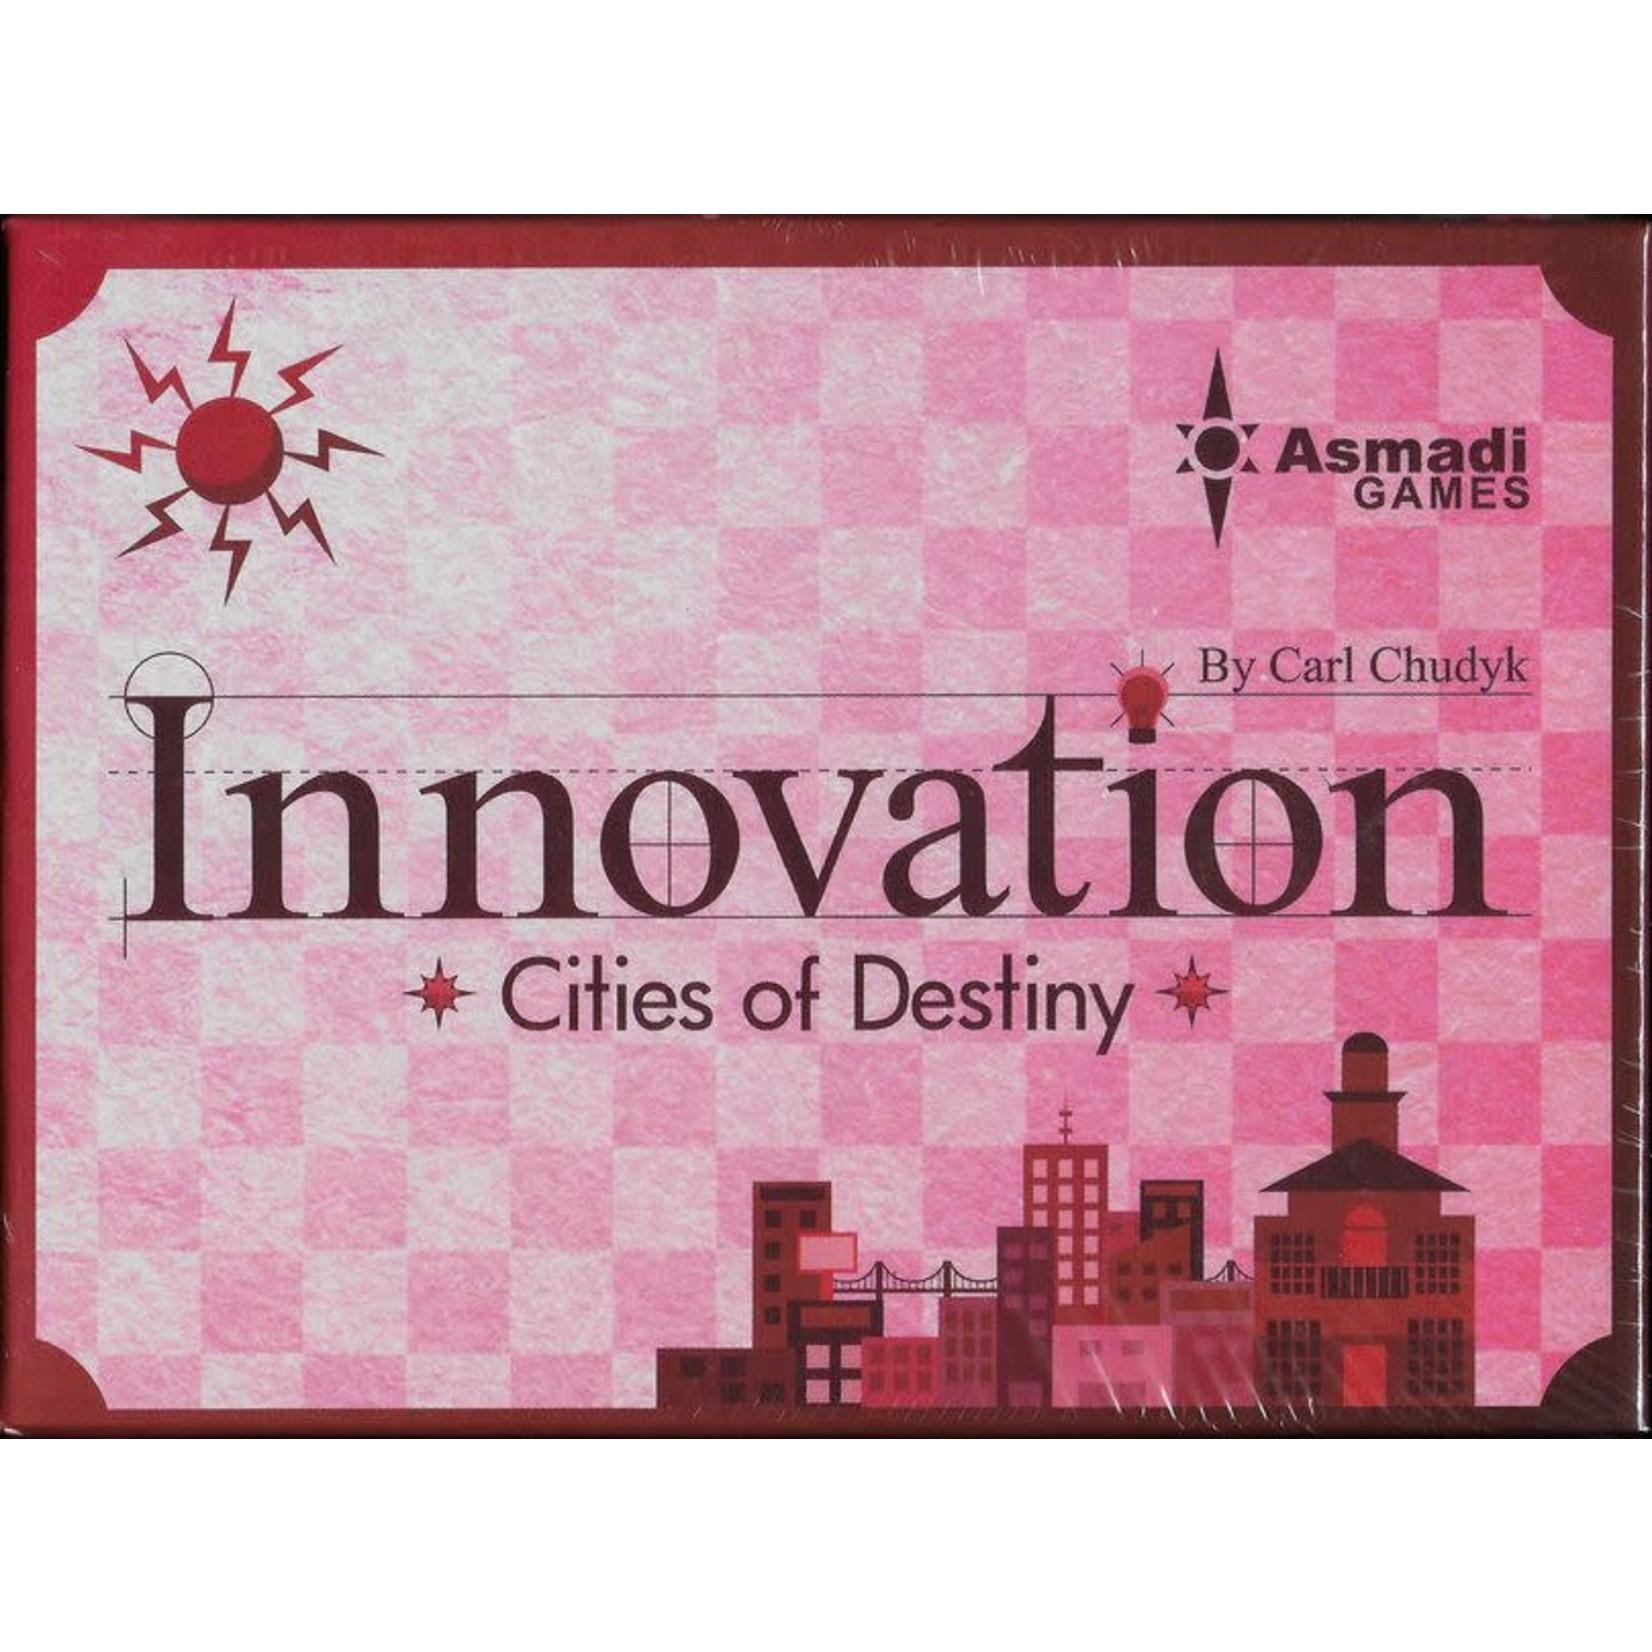 Asmadi Innovation: Cities of Destiny